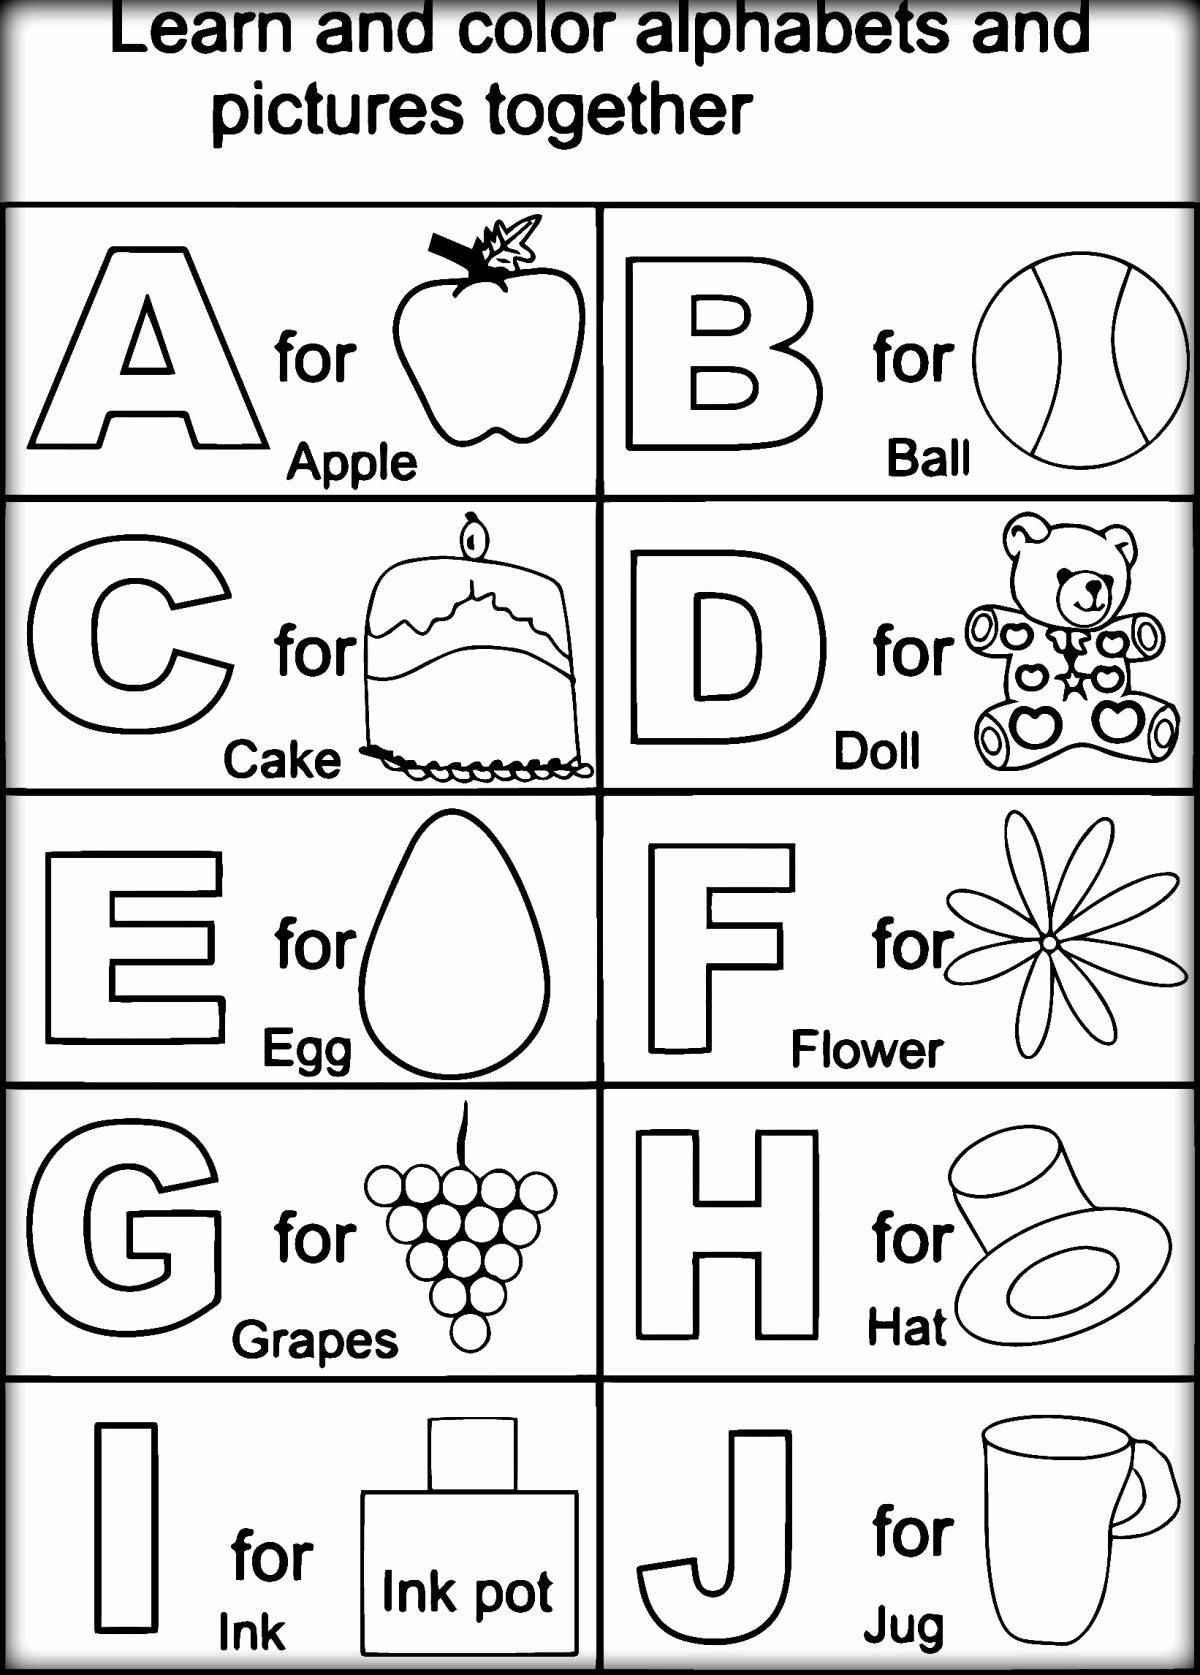 kindergarten coloring pages educational 2b2bcbe59a3406b8a65ac3dfcb1ba493 educational forarten 1200 sheet worksheet